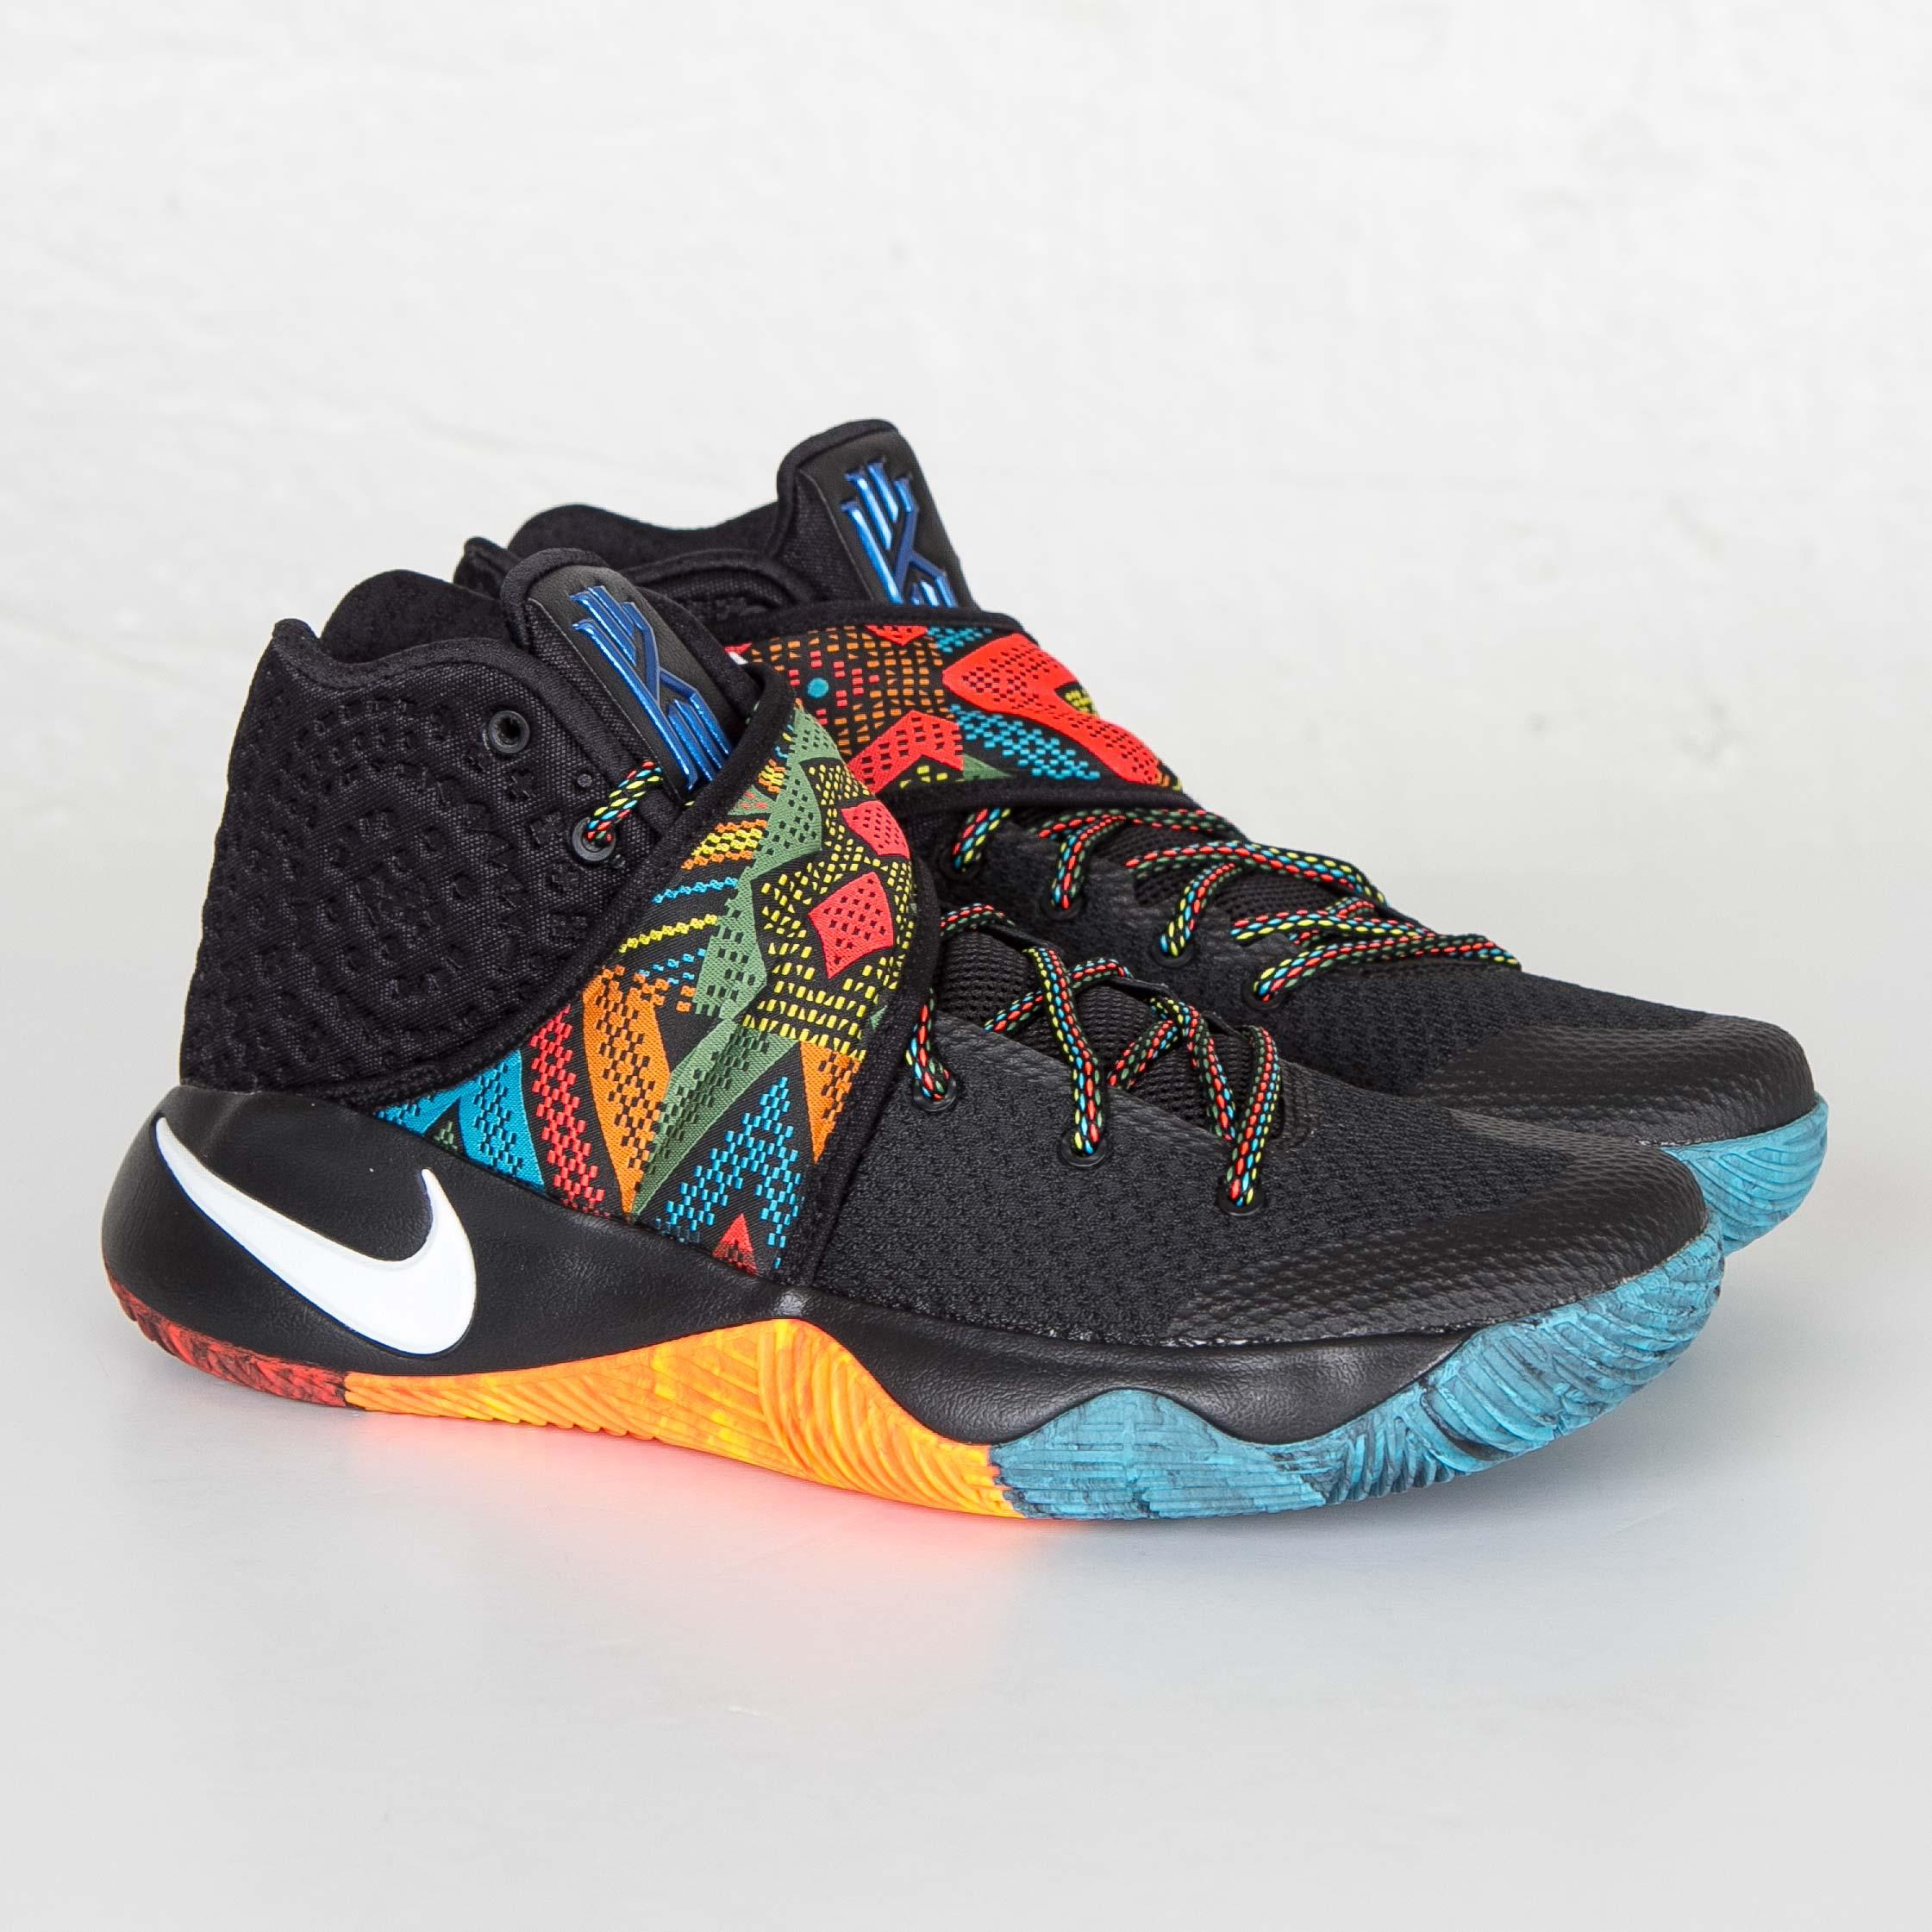 9859cceb81c9 Nike Kyrie 2 BHM - 828375-099 - Sneakersnstuff